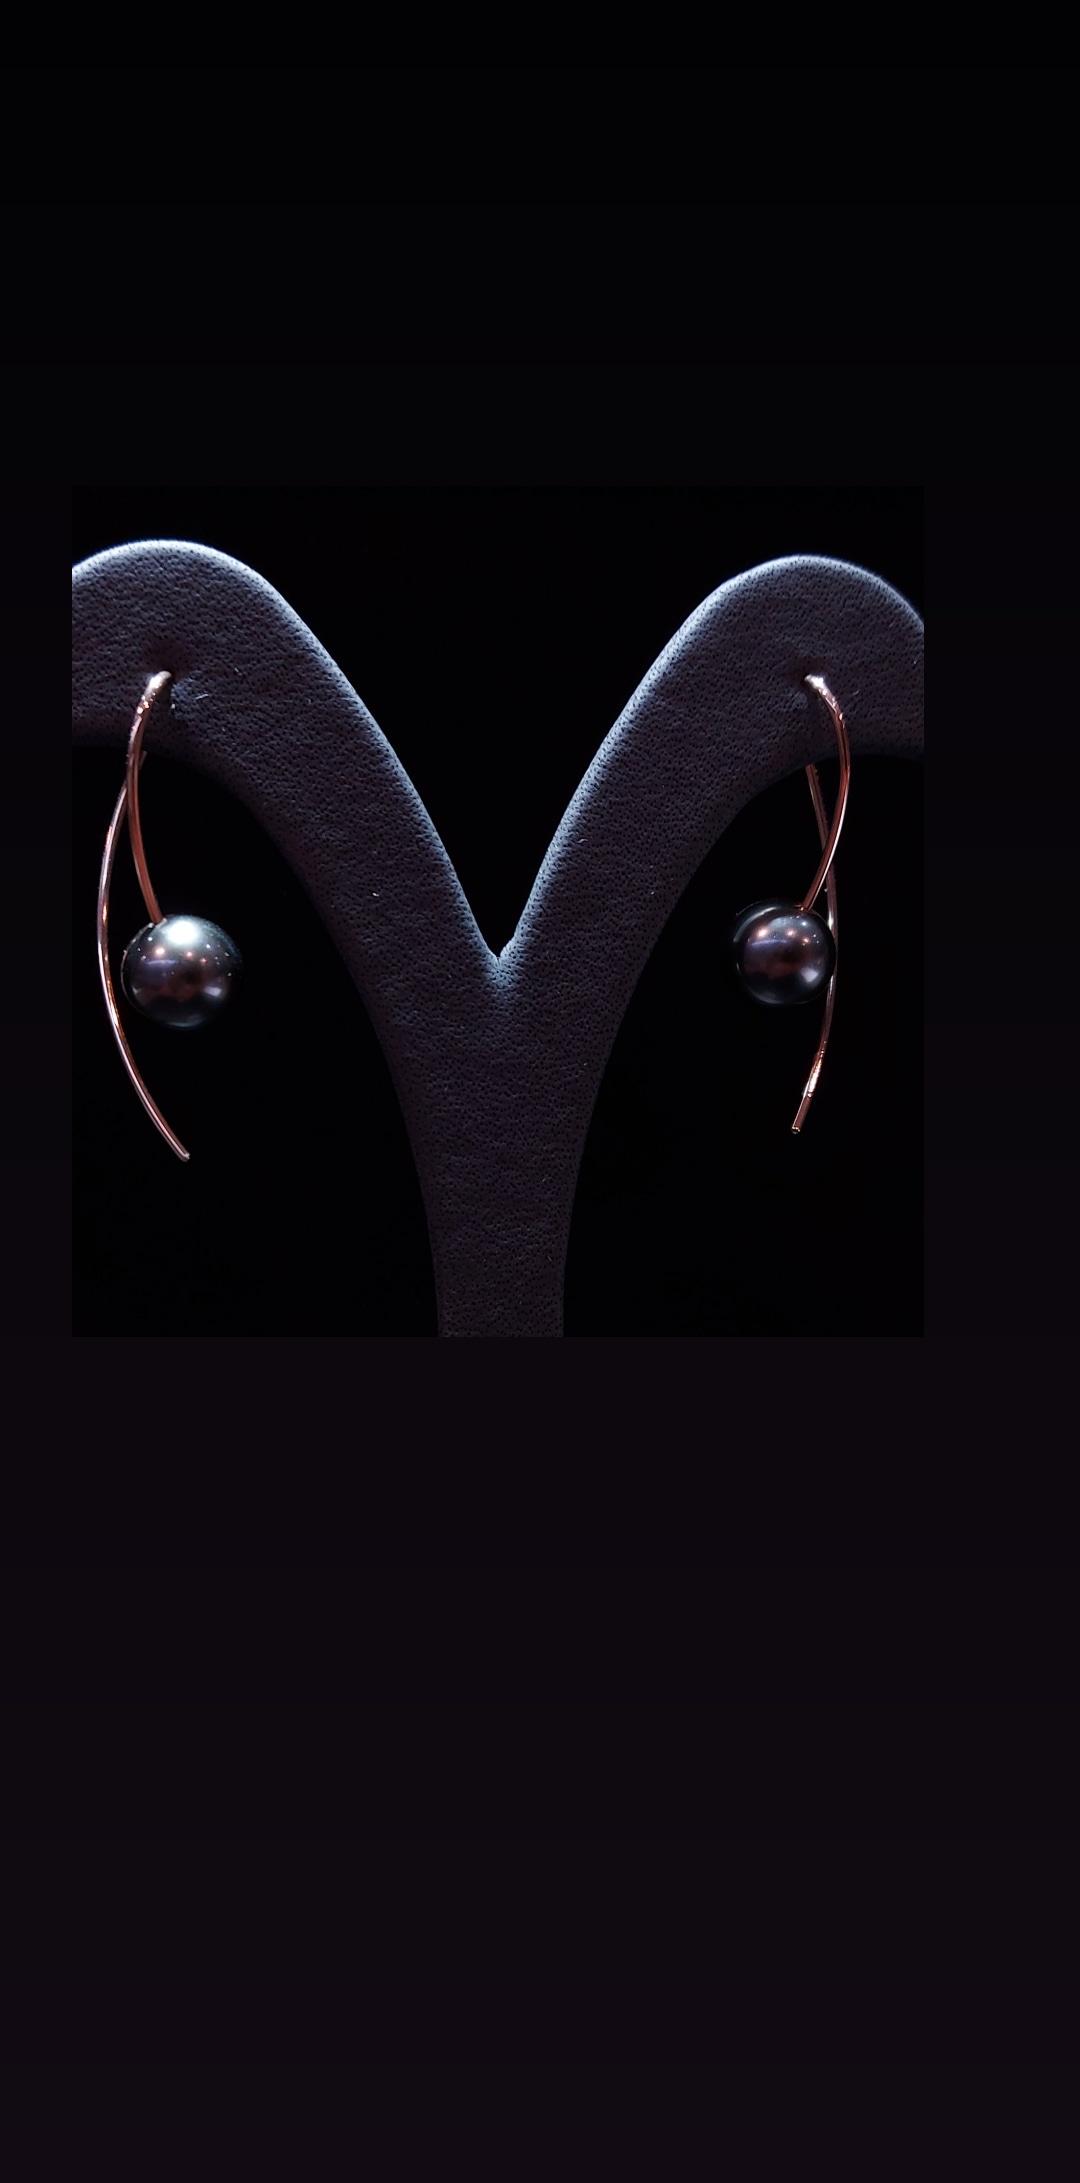 Pendants d\'oreilles COURBES en or rose 2 perles de Tahiti